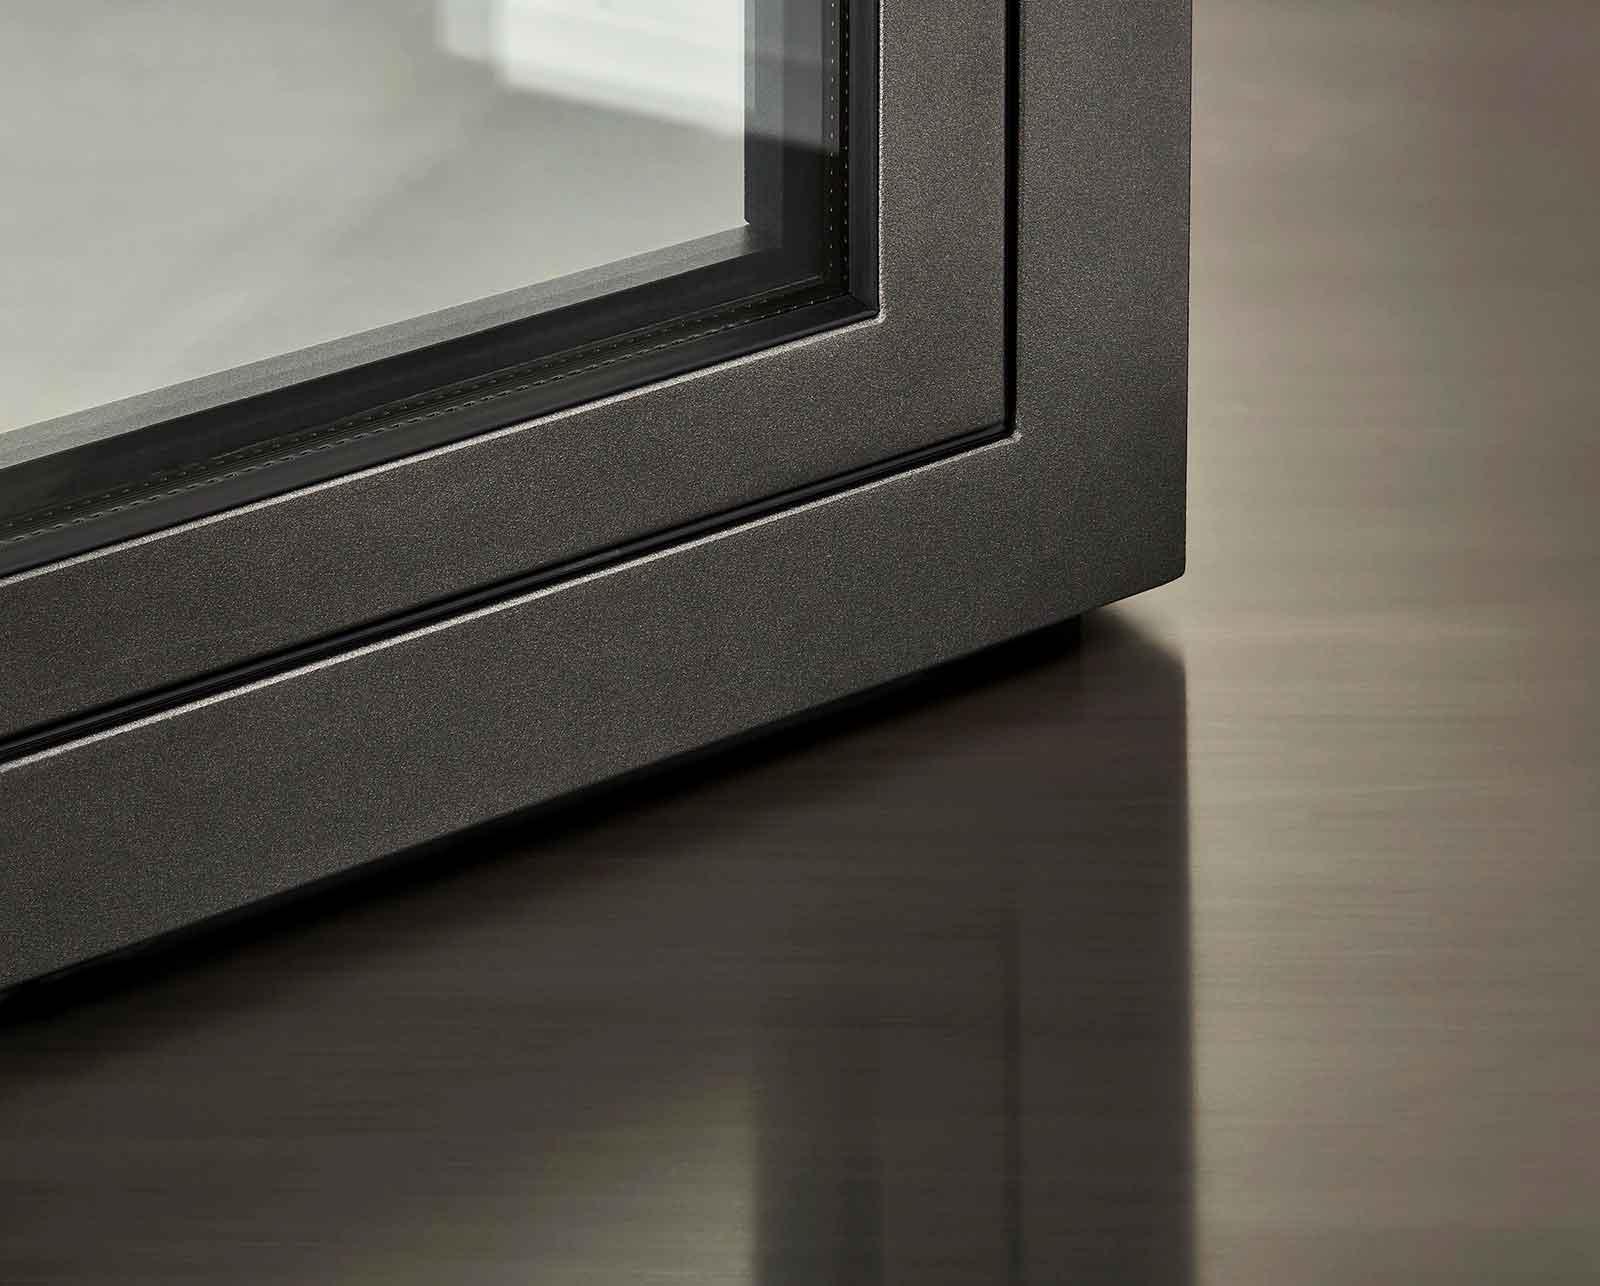 درب-و-پنجره-یو-پی-وی-سی-رنگی-آماج-صنعت-رنگی-100